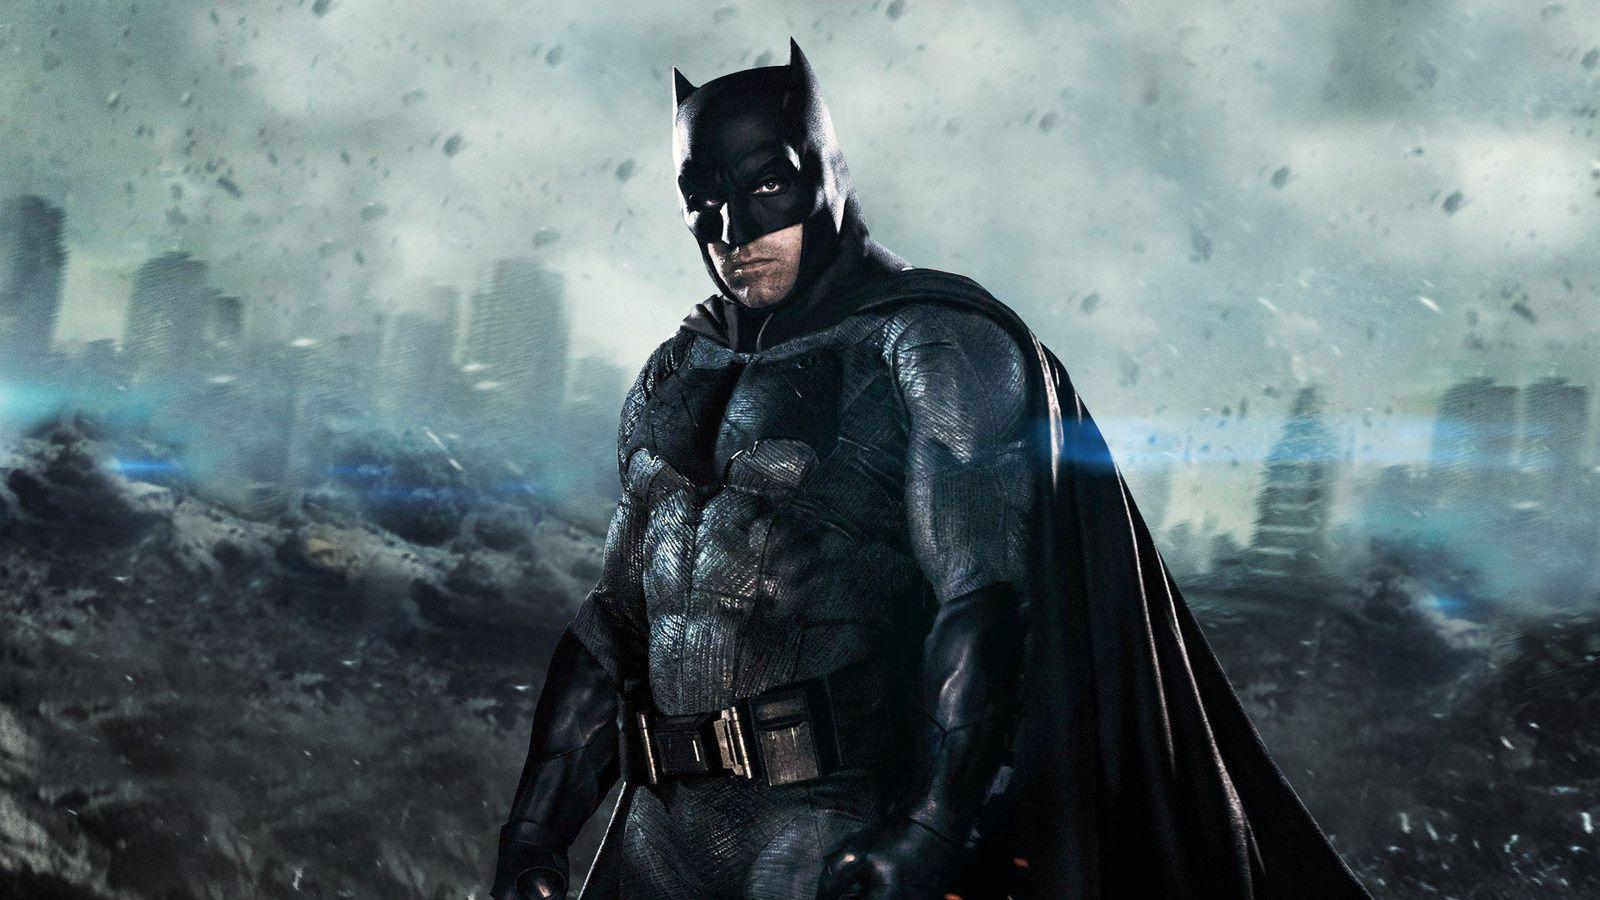 Ben Affleck ne réalisera finalement pas The Batman